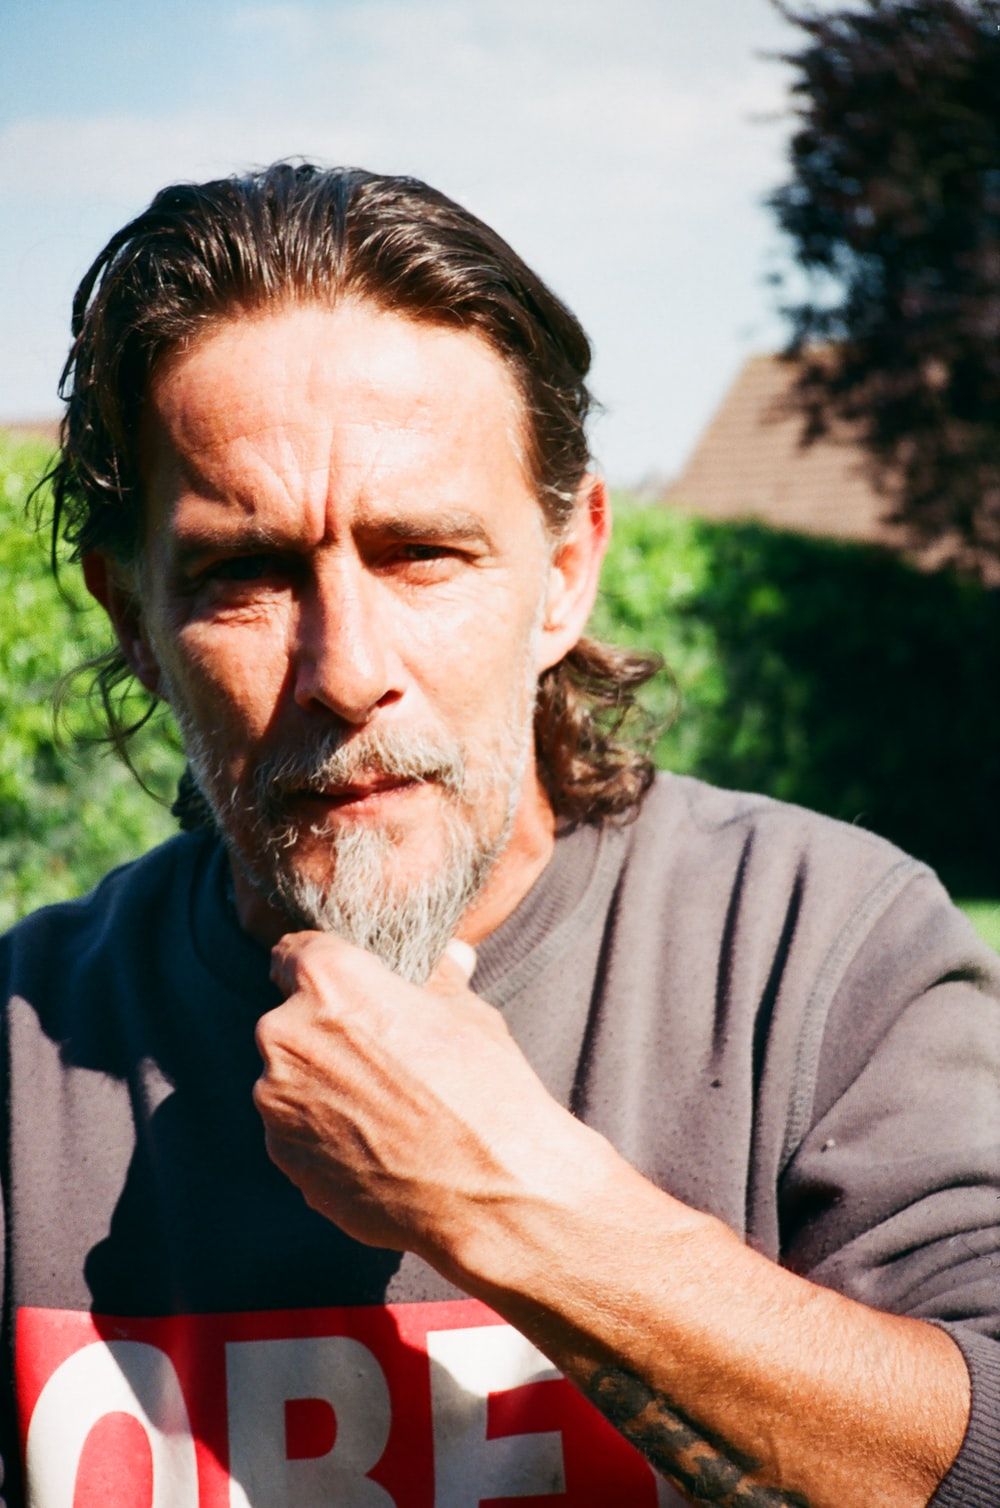 man in gray crew neck long sleeve shirt